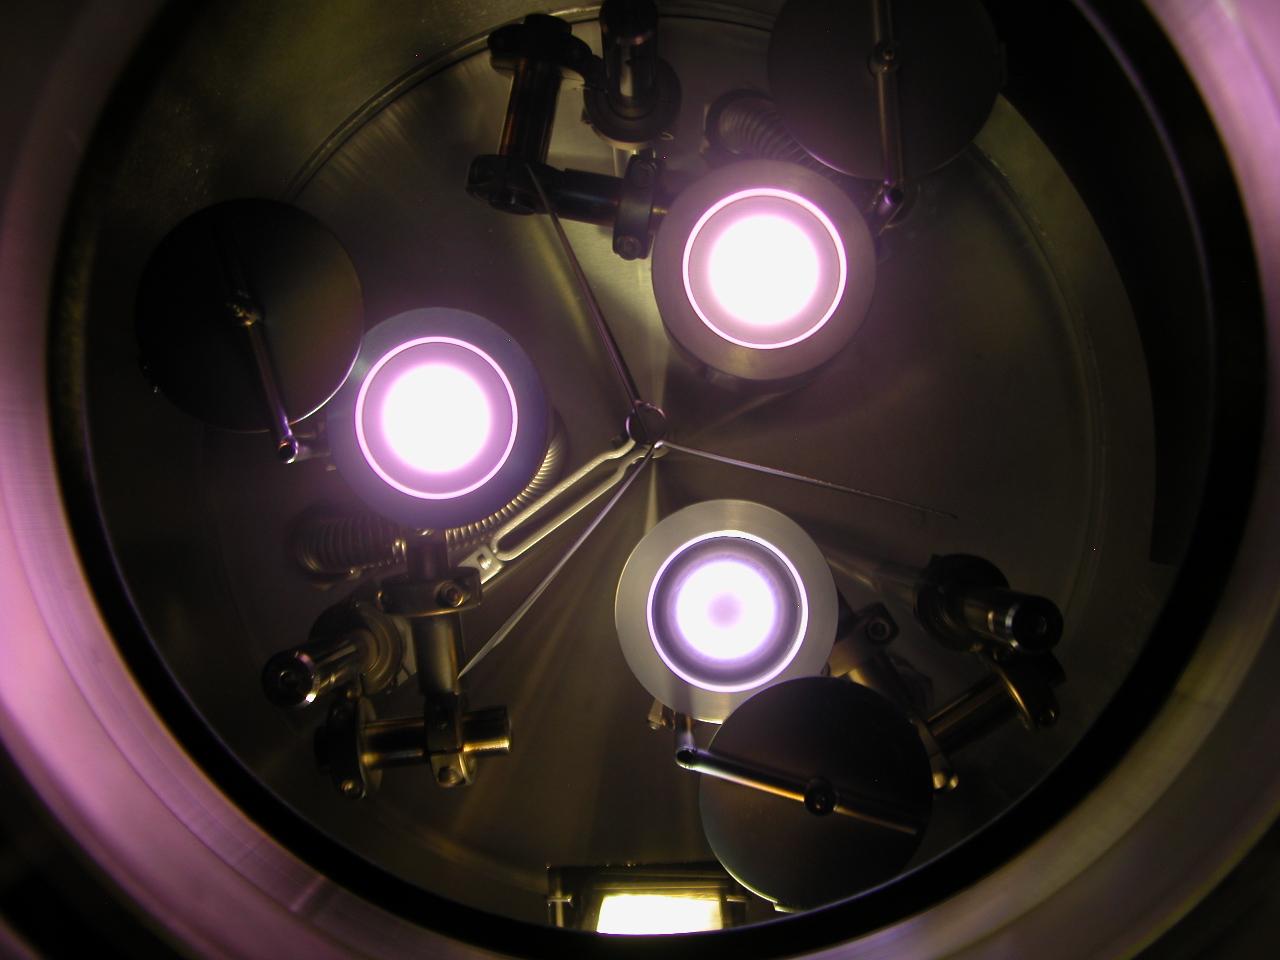 VCT-1800 cathodes